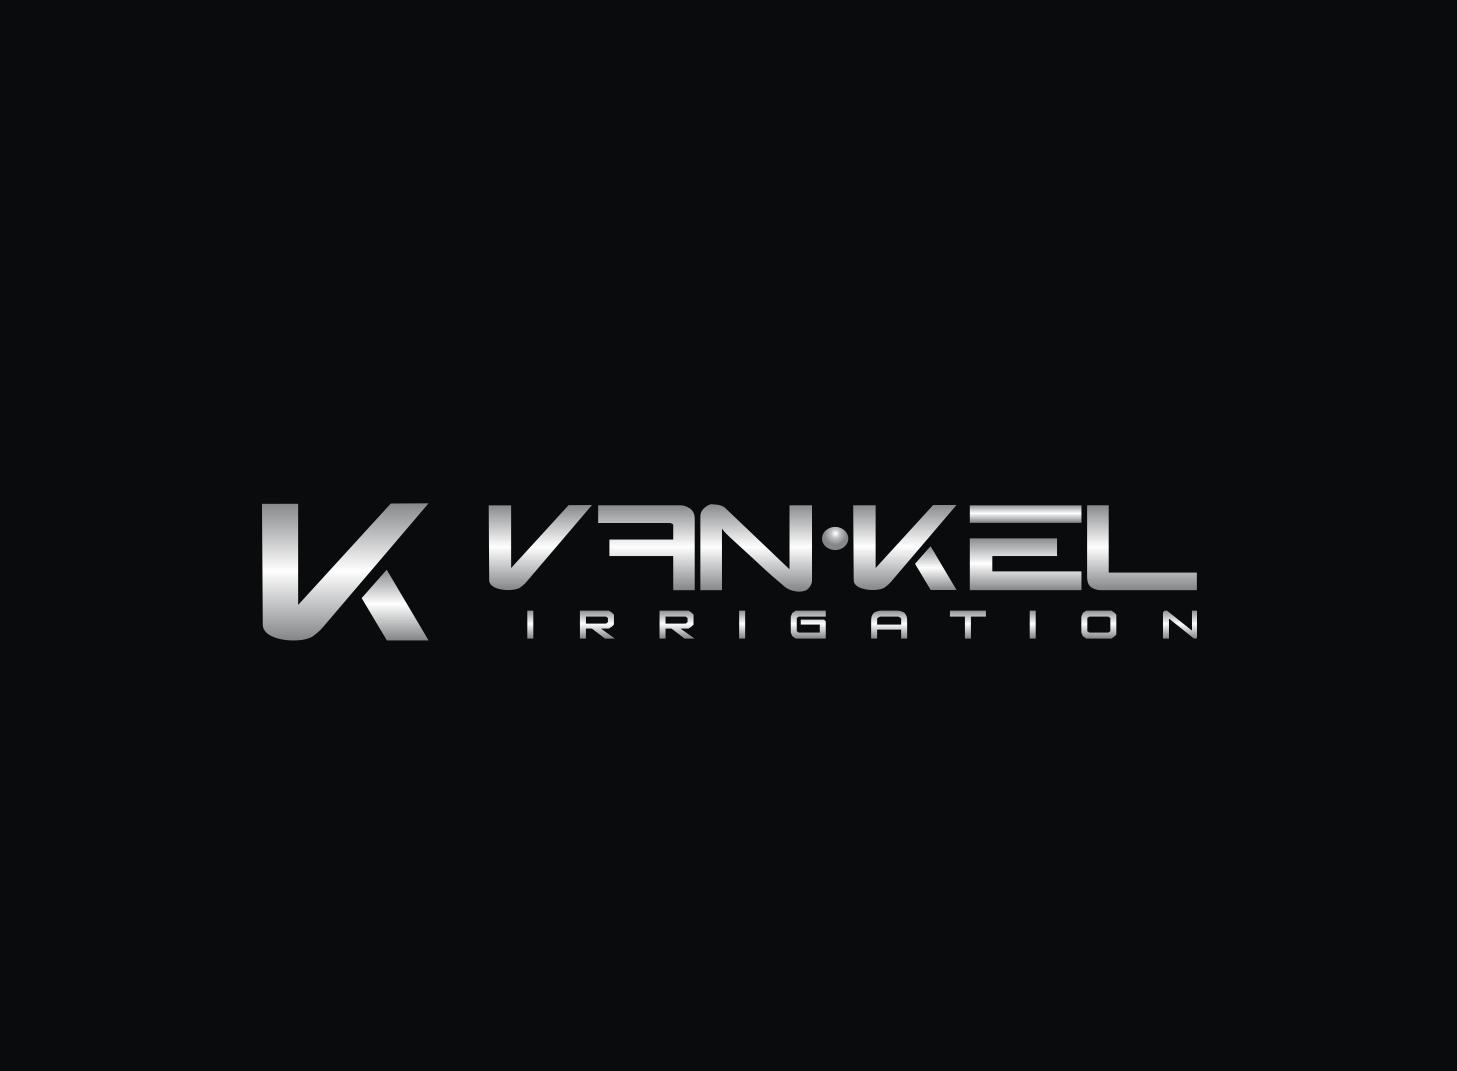 Logo Design by Zdravko Krulj - Entry No. 37 in the Logo Design Contest Van-Kel Irrigation Logo Design.